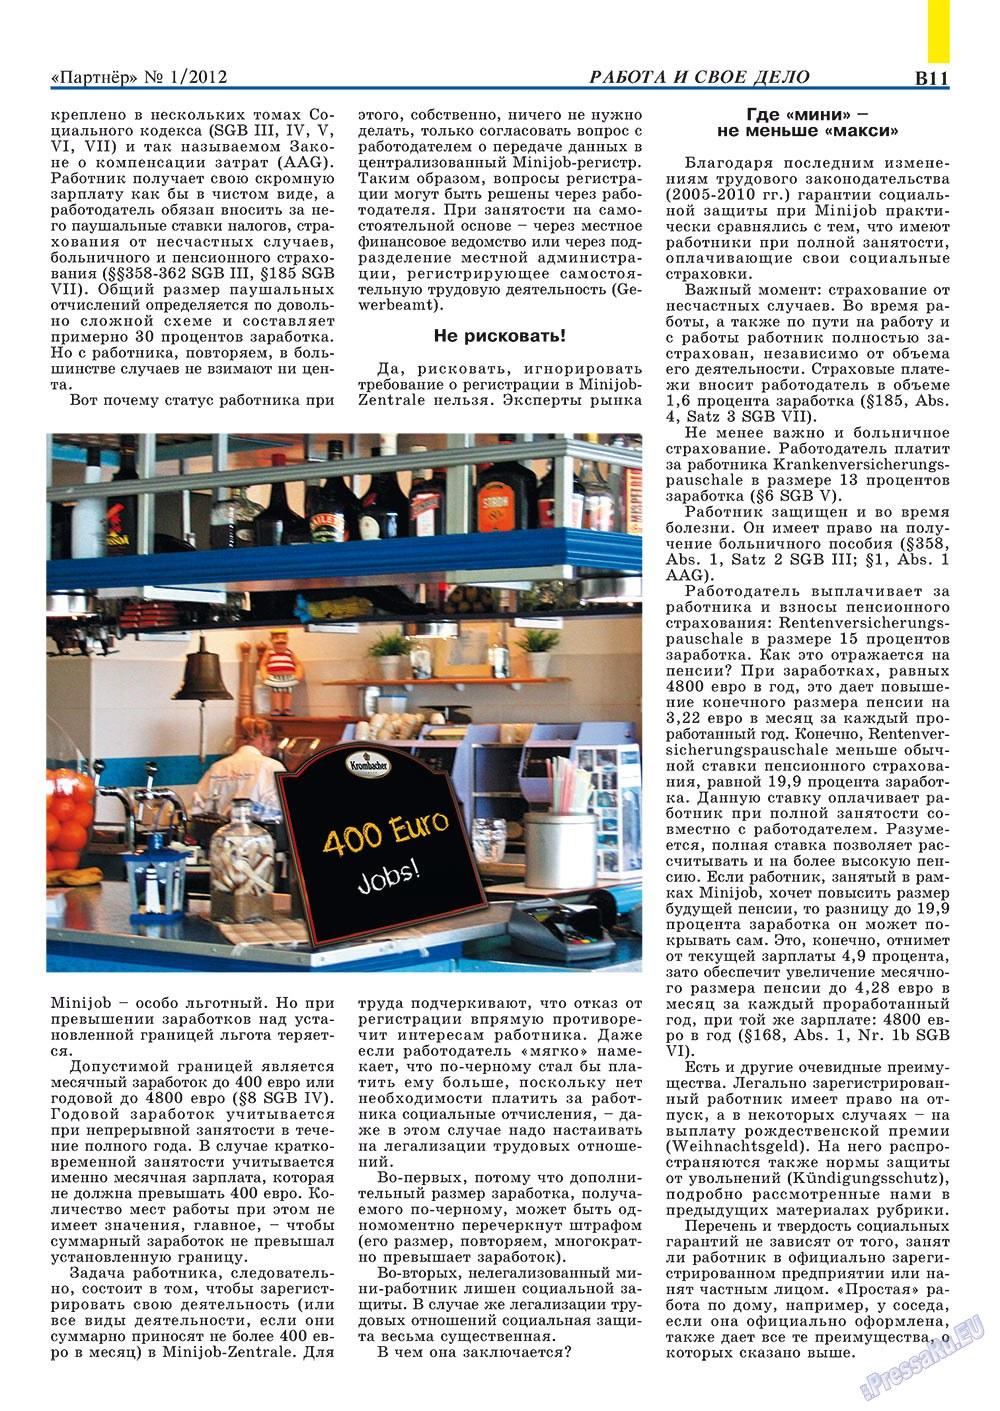 Партнер-север (журнал). 2012 год, номер 1, стр. 21